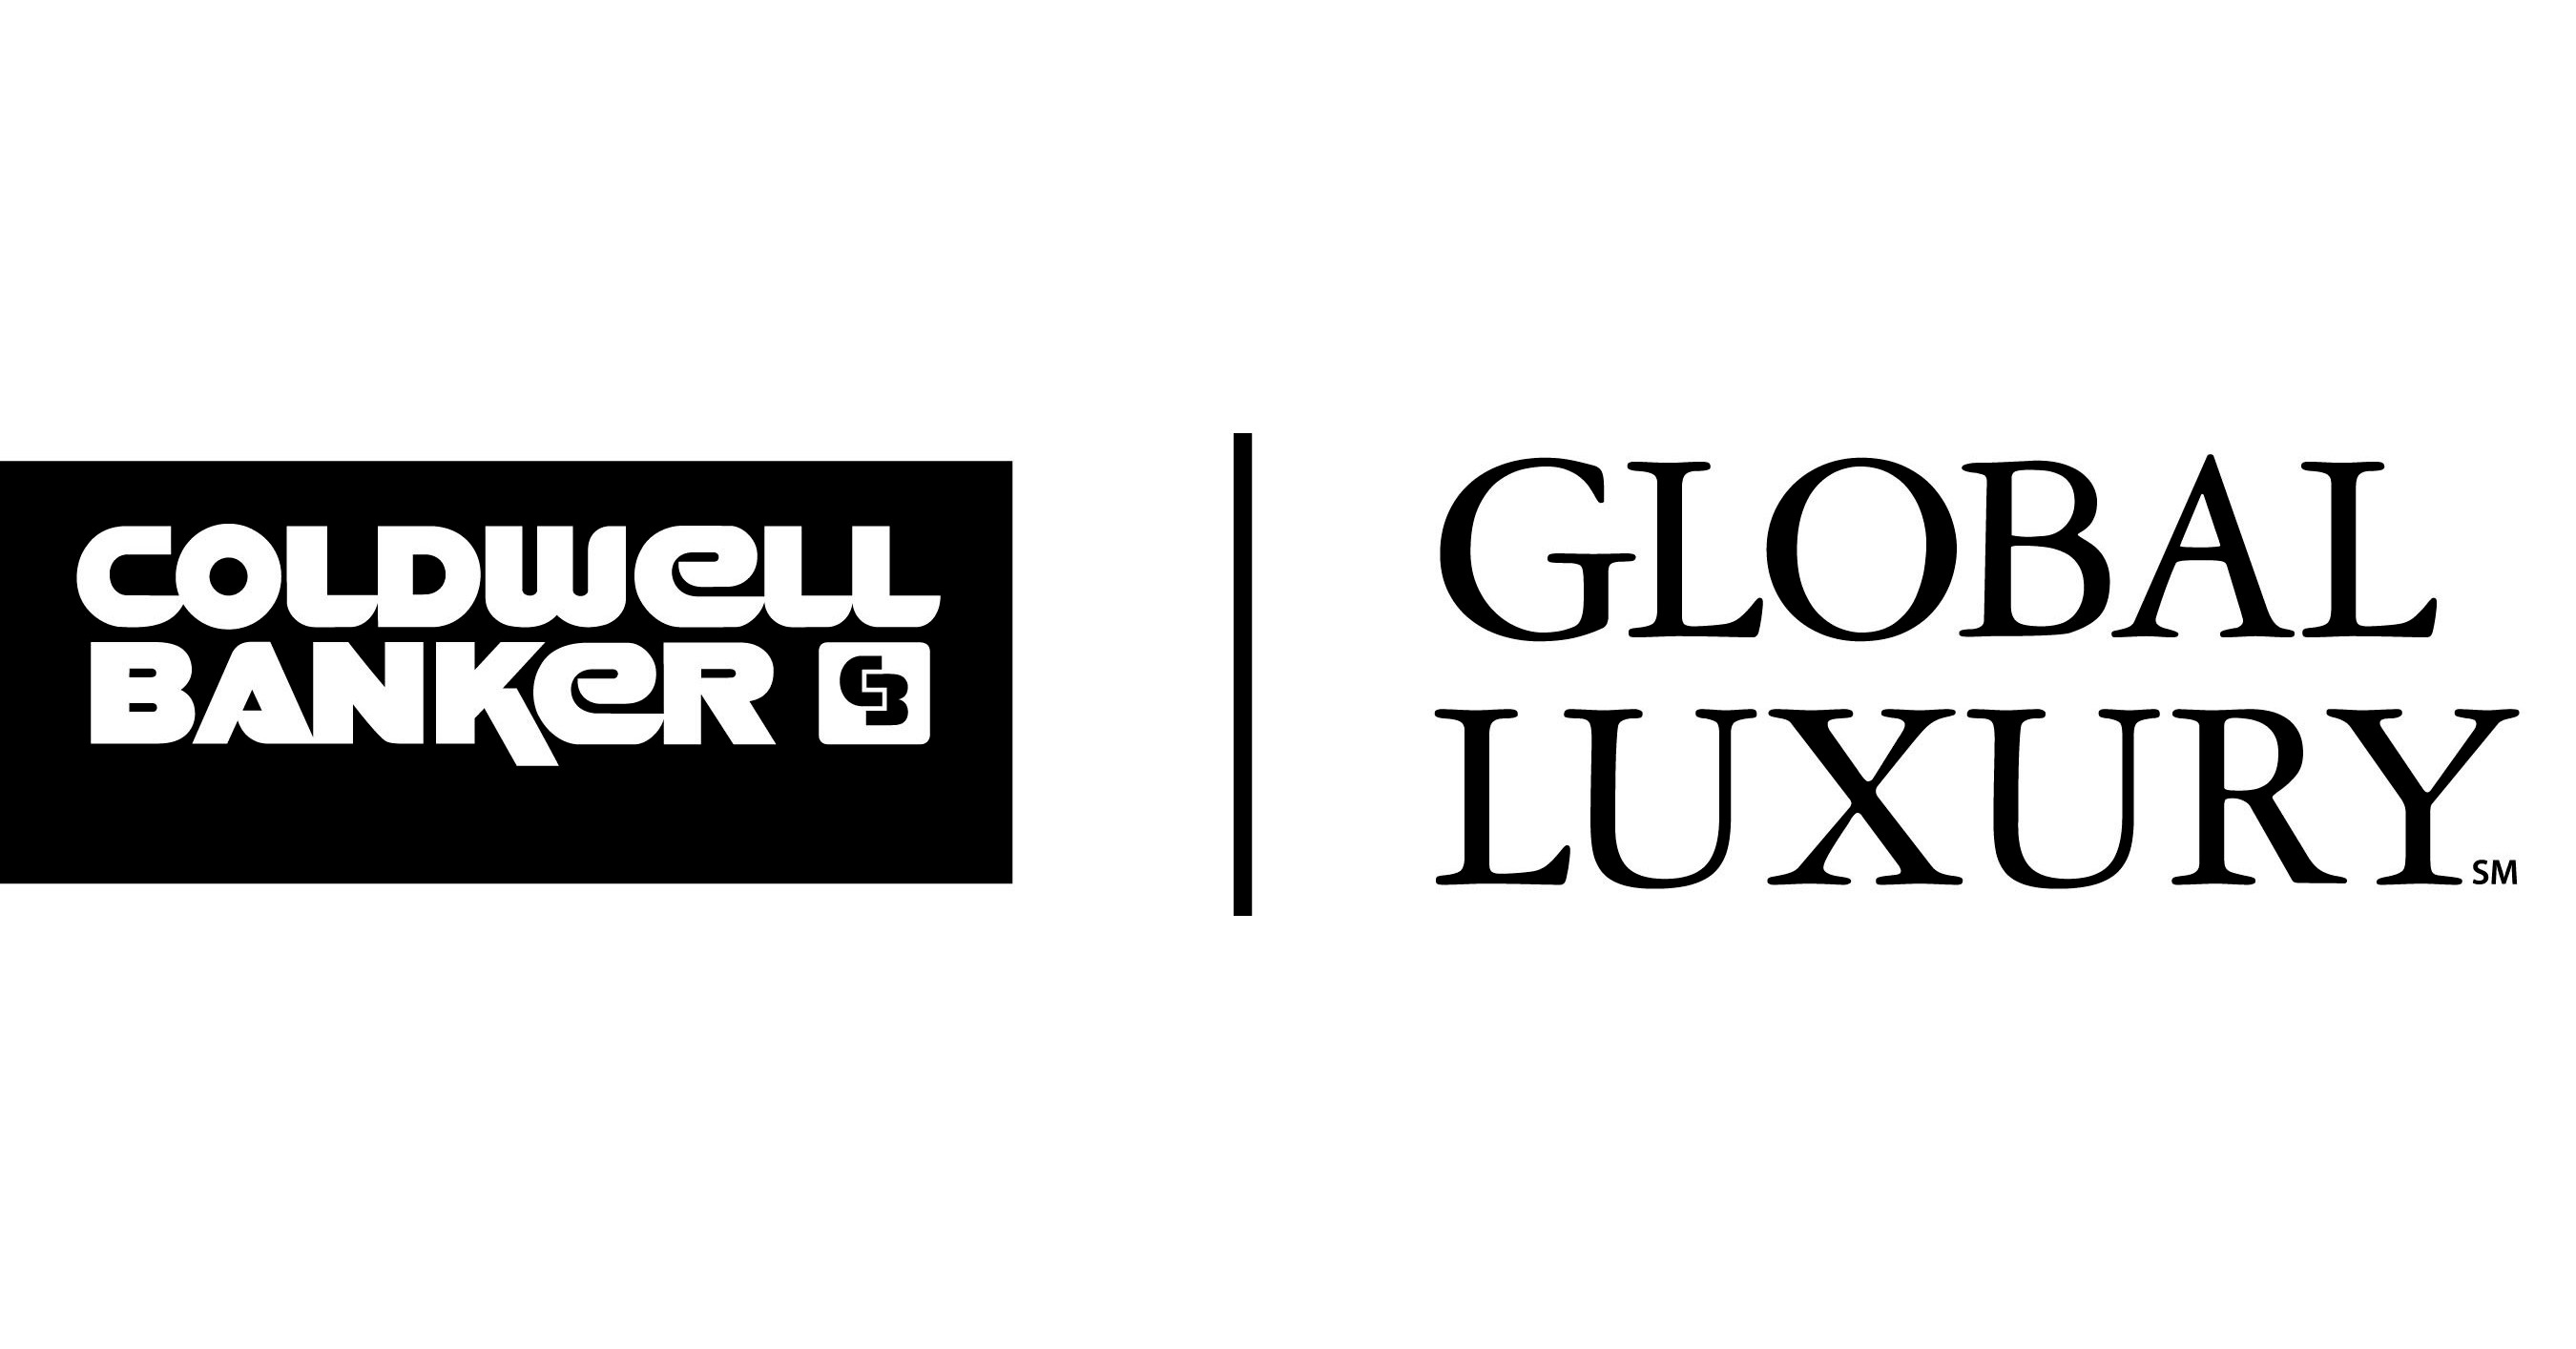 globallux